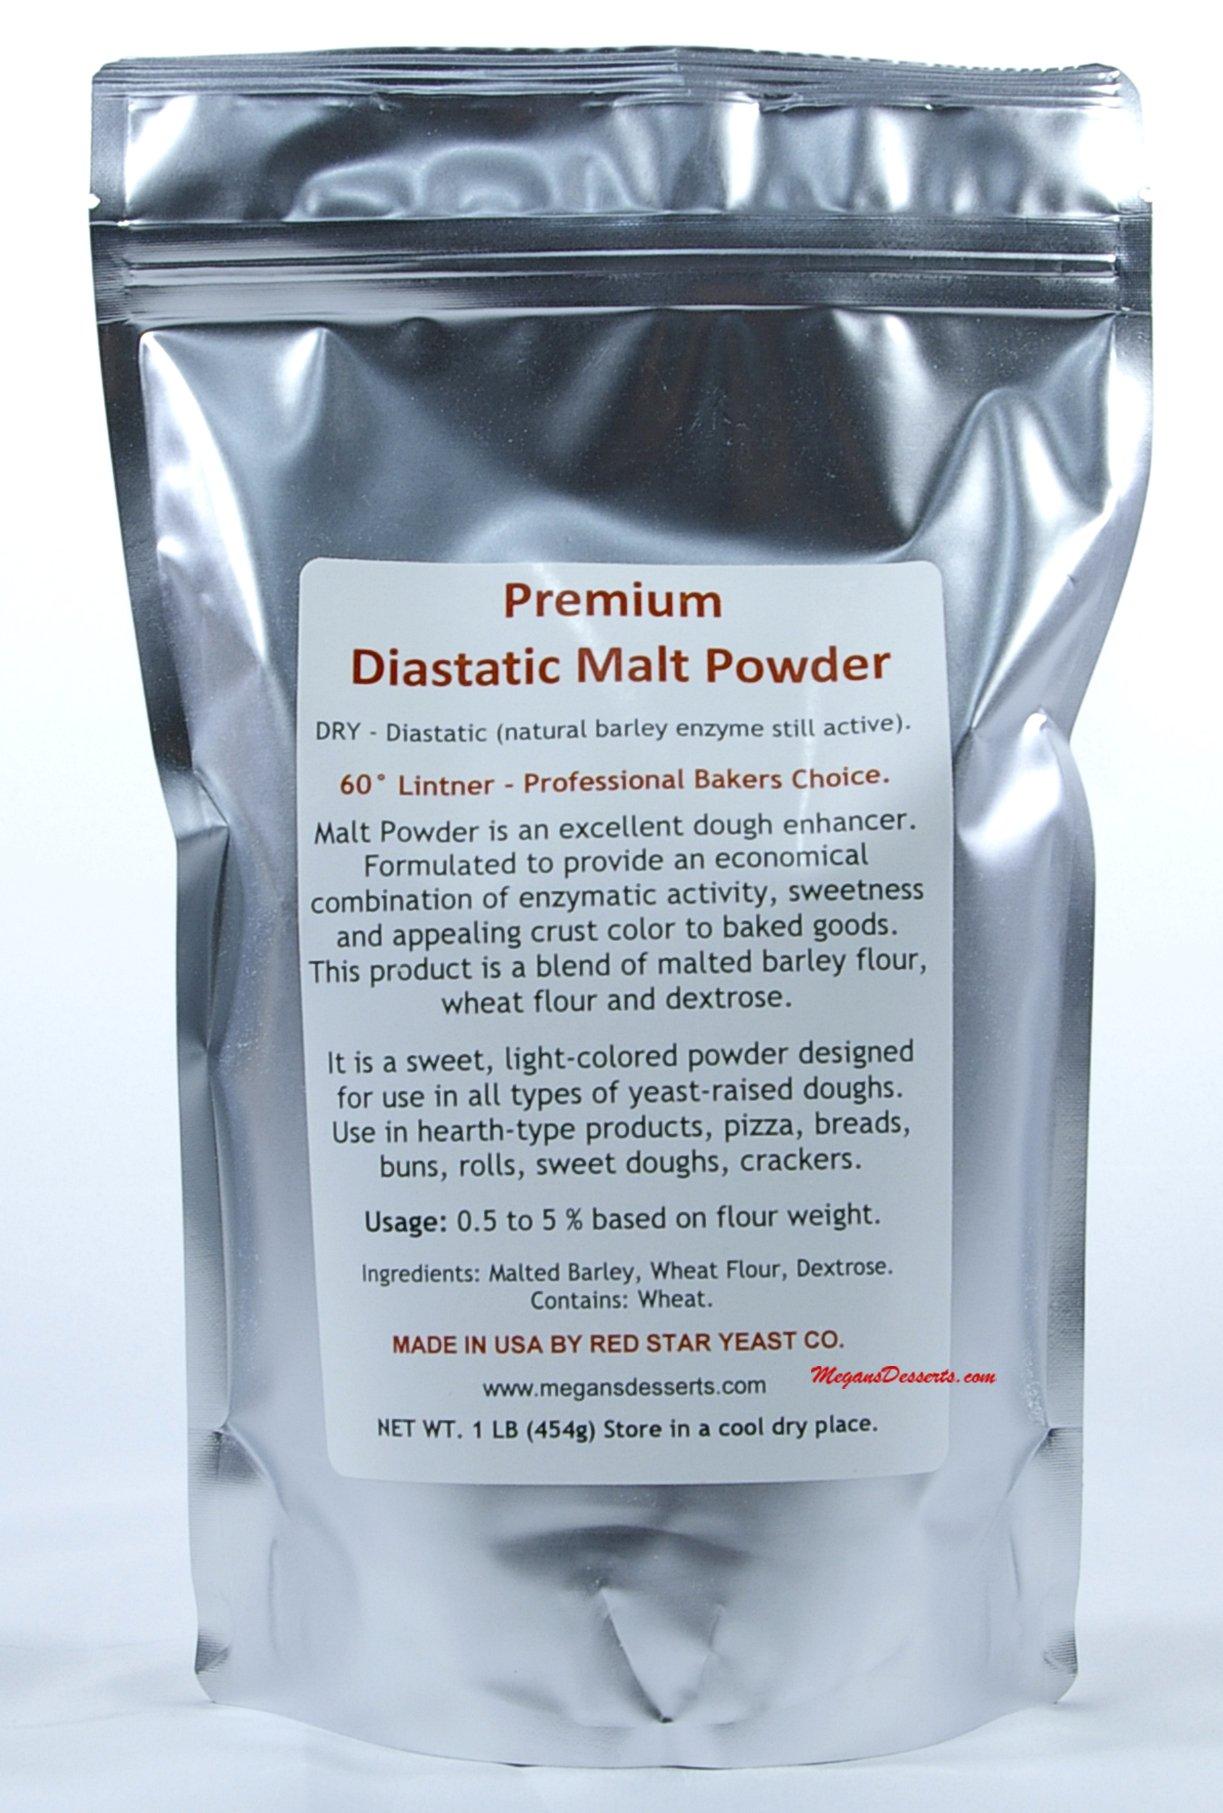 Diastatic Malt Powder 16 oz. - (1lb) Bag, Made by Red Star Yeast Company